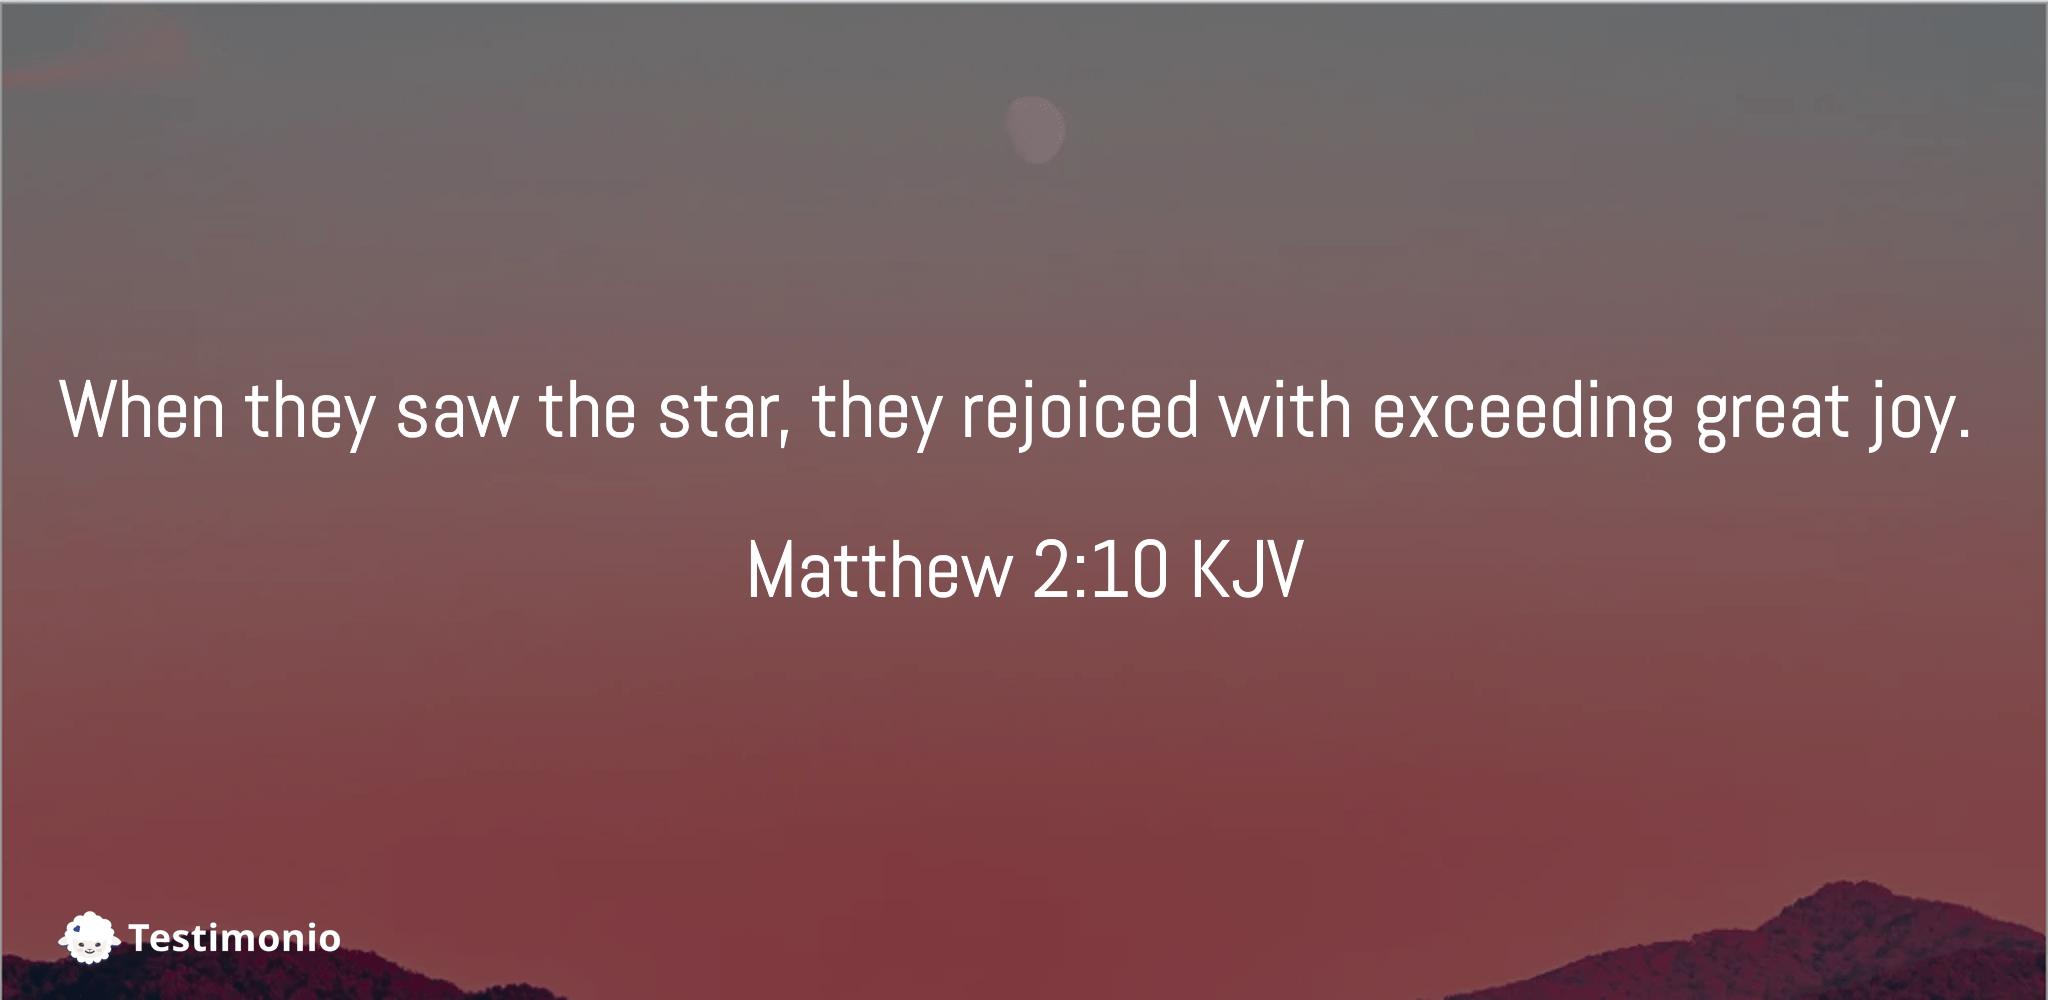 Matthew 2:10